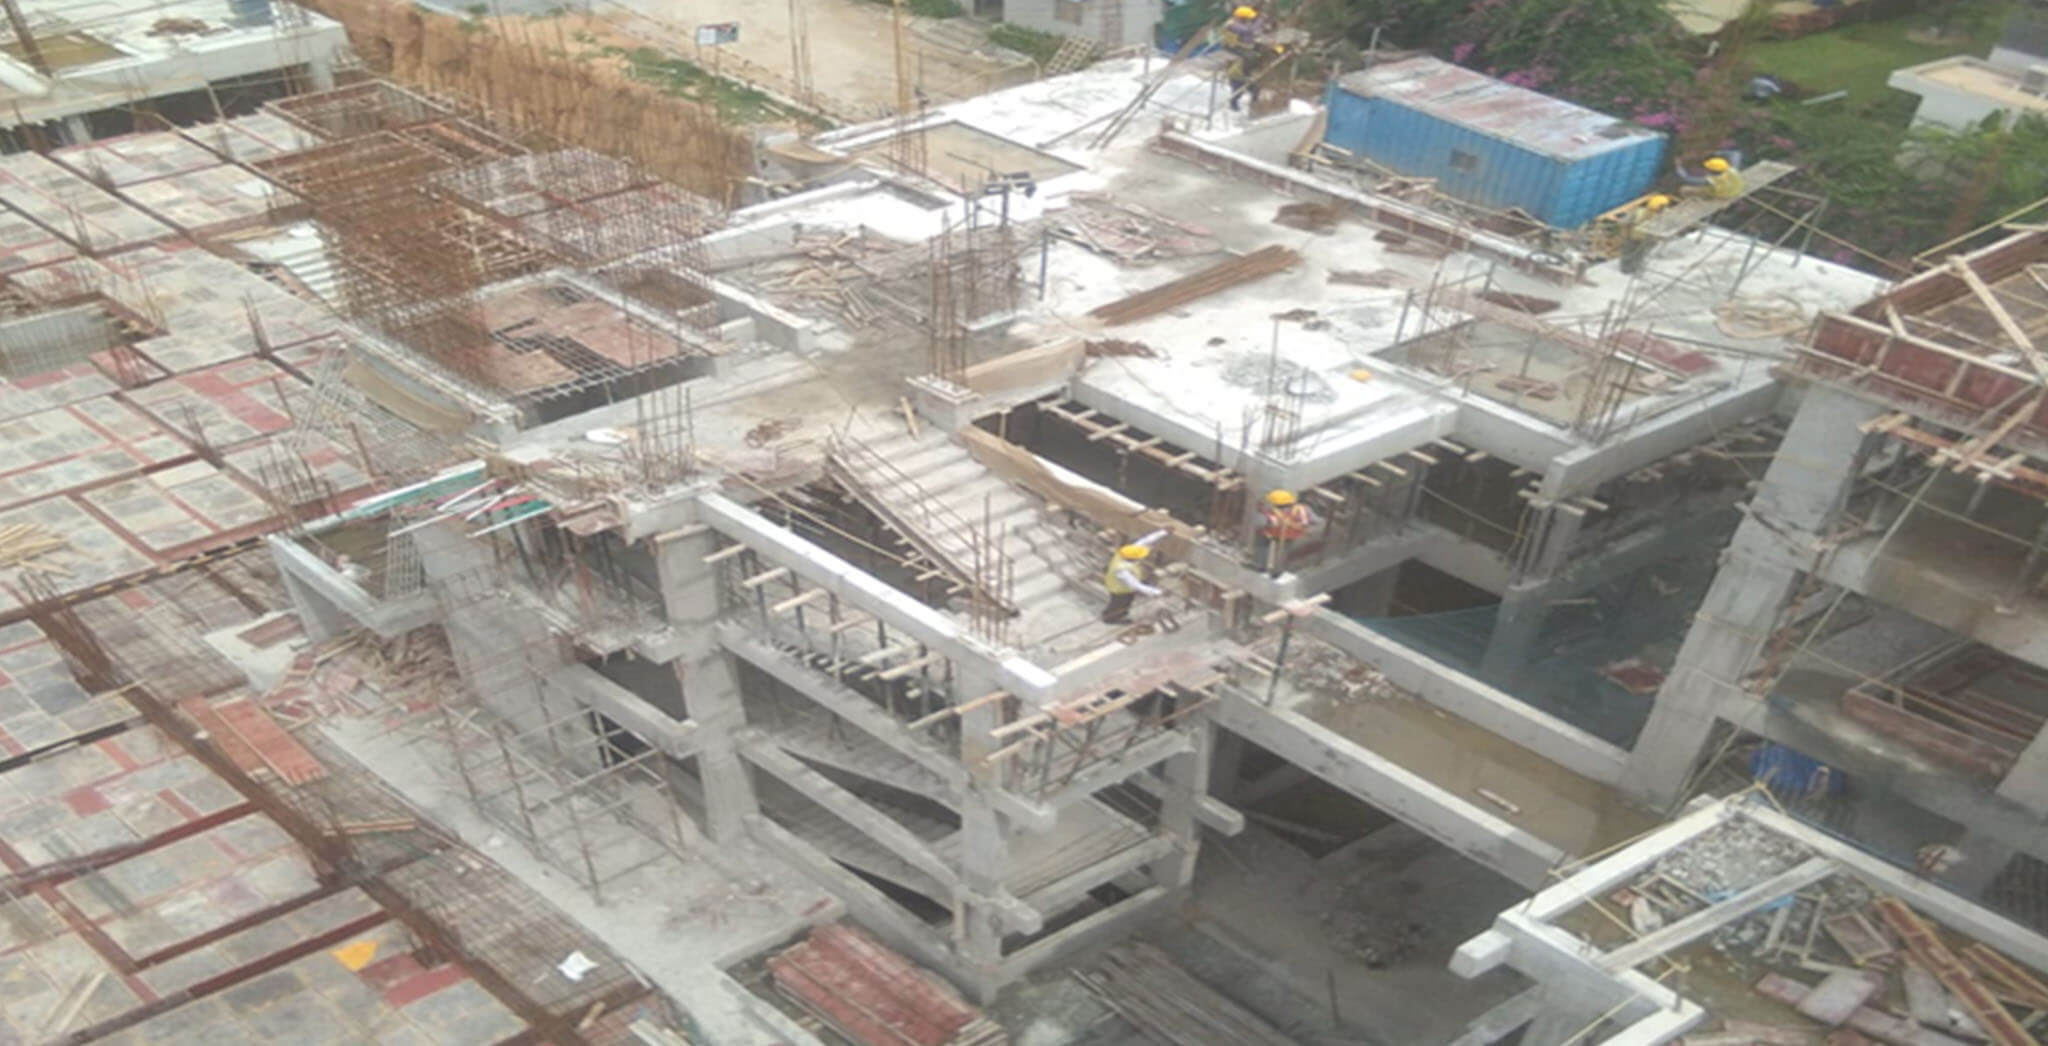 Jul 2020 - North side view: H Block—3rd floor pour-1 slab completed; 3rd floor to 4th floor column rebar work-in-progress.